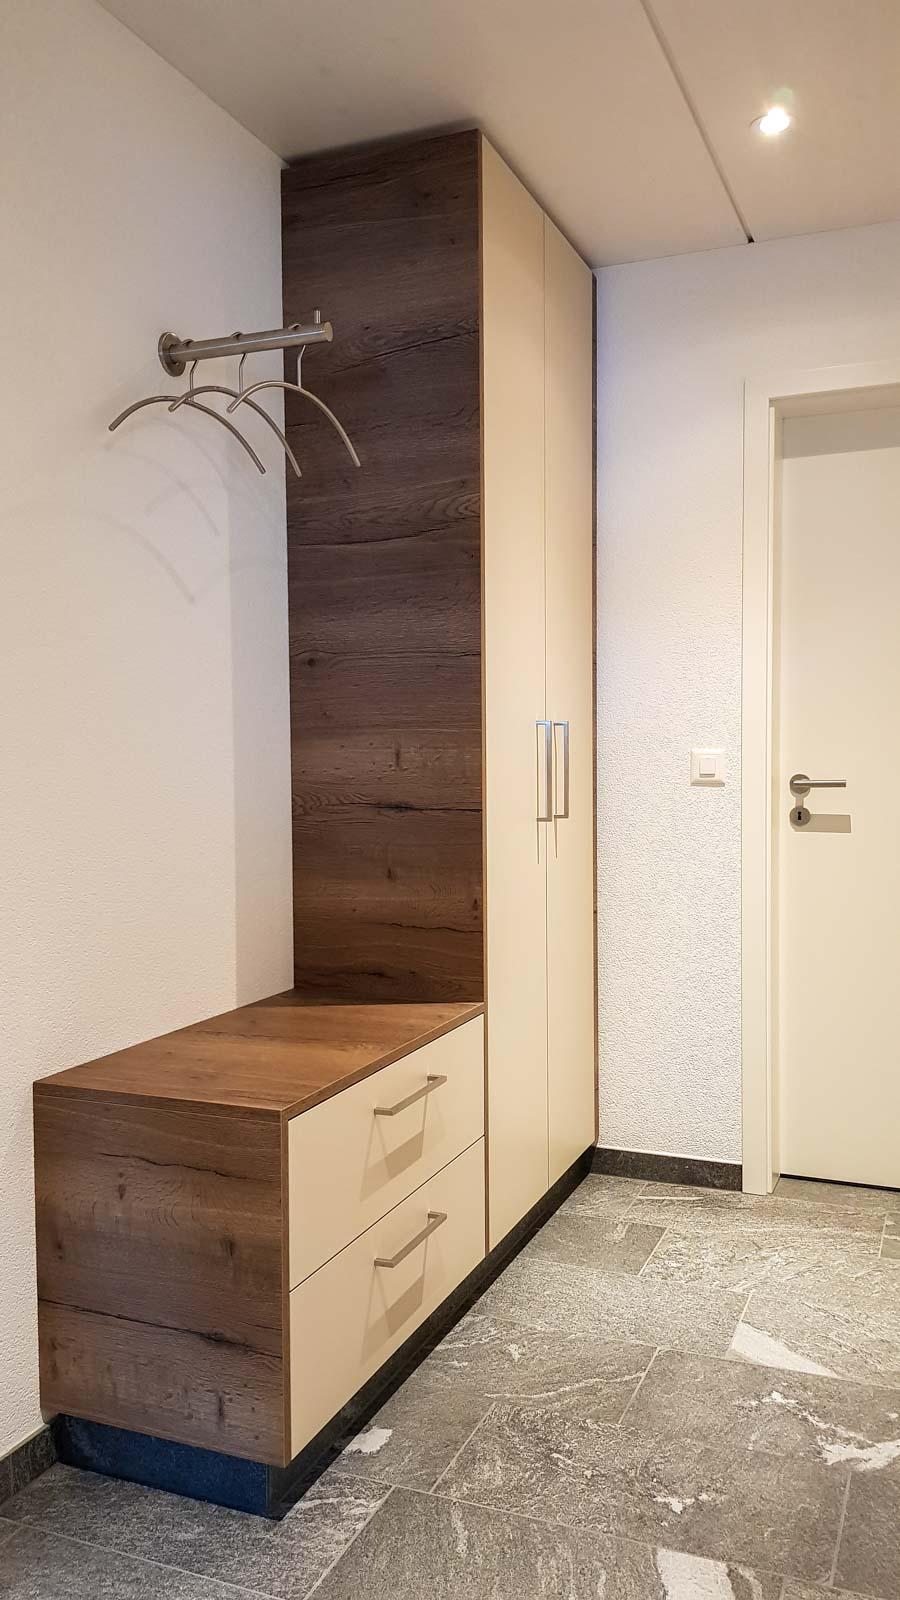 Wooddesign_Garderobe_Gästegarderobe_Holzdecor_weiss_offene Gästegarderobe (2)